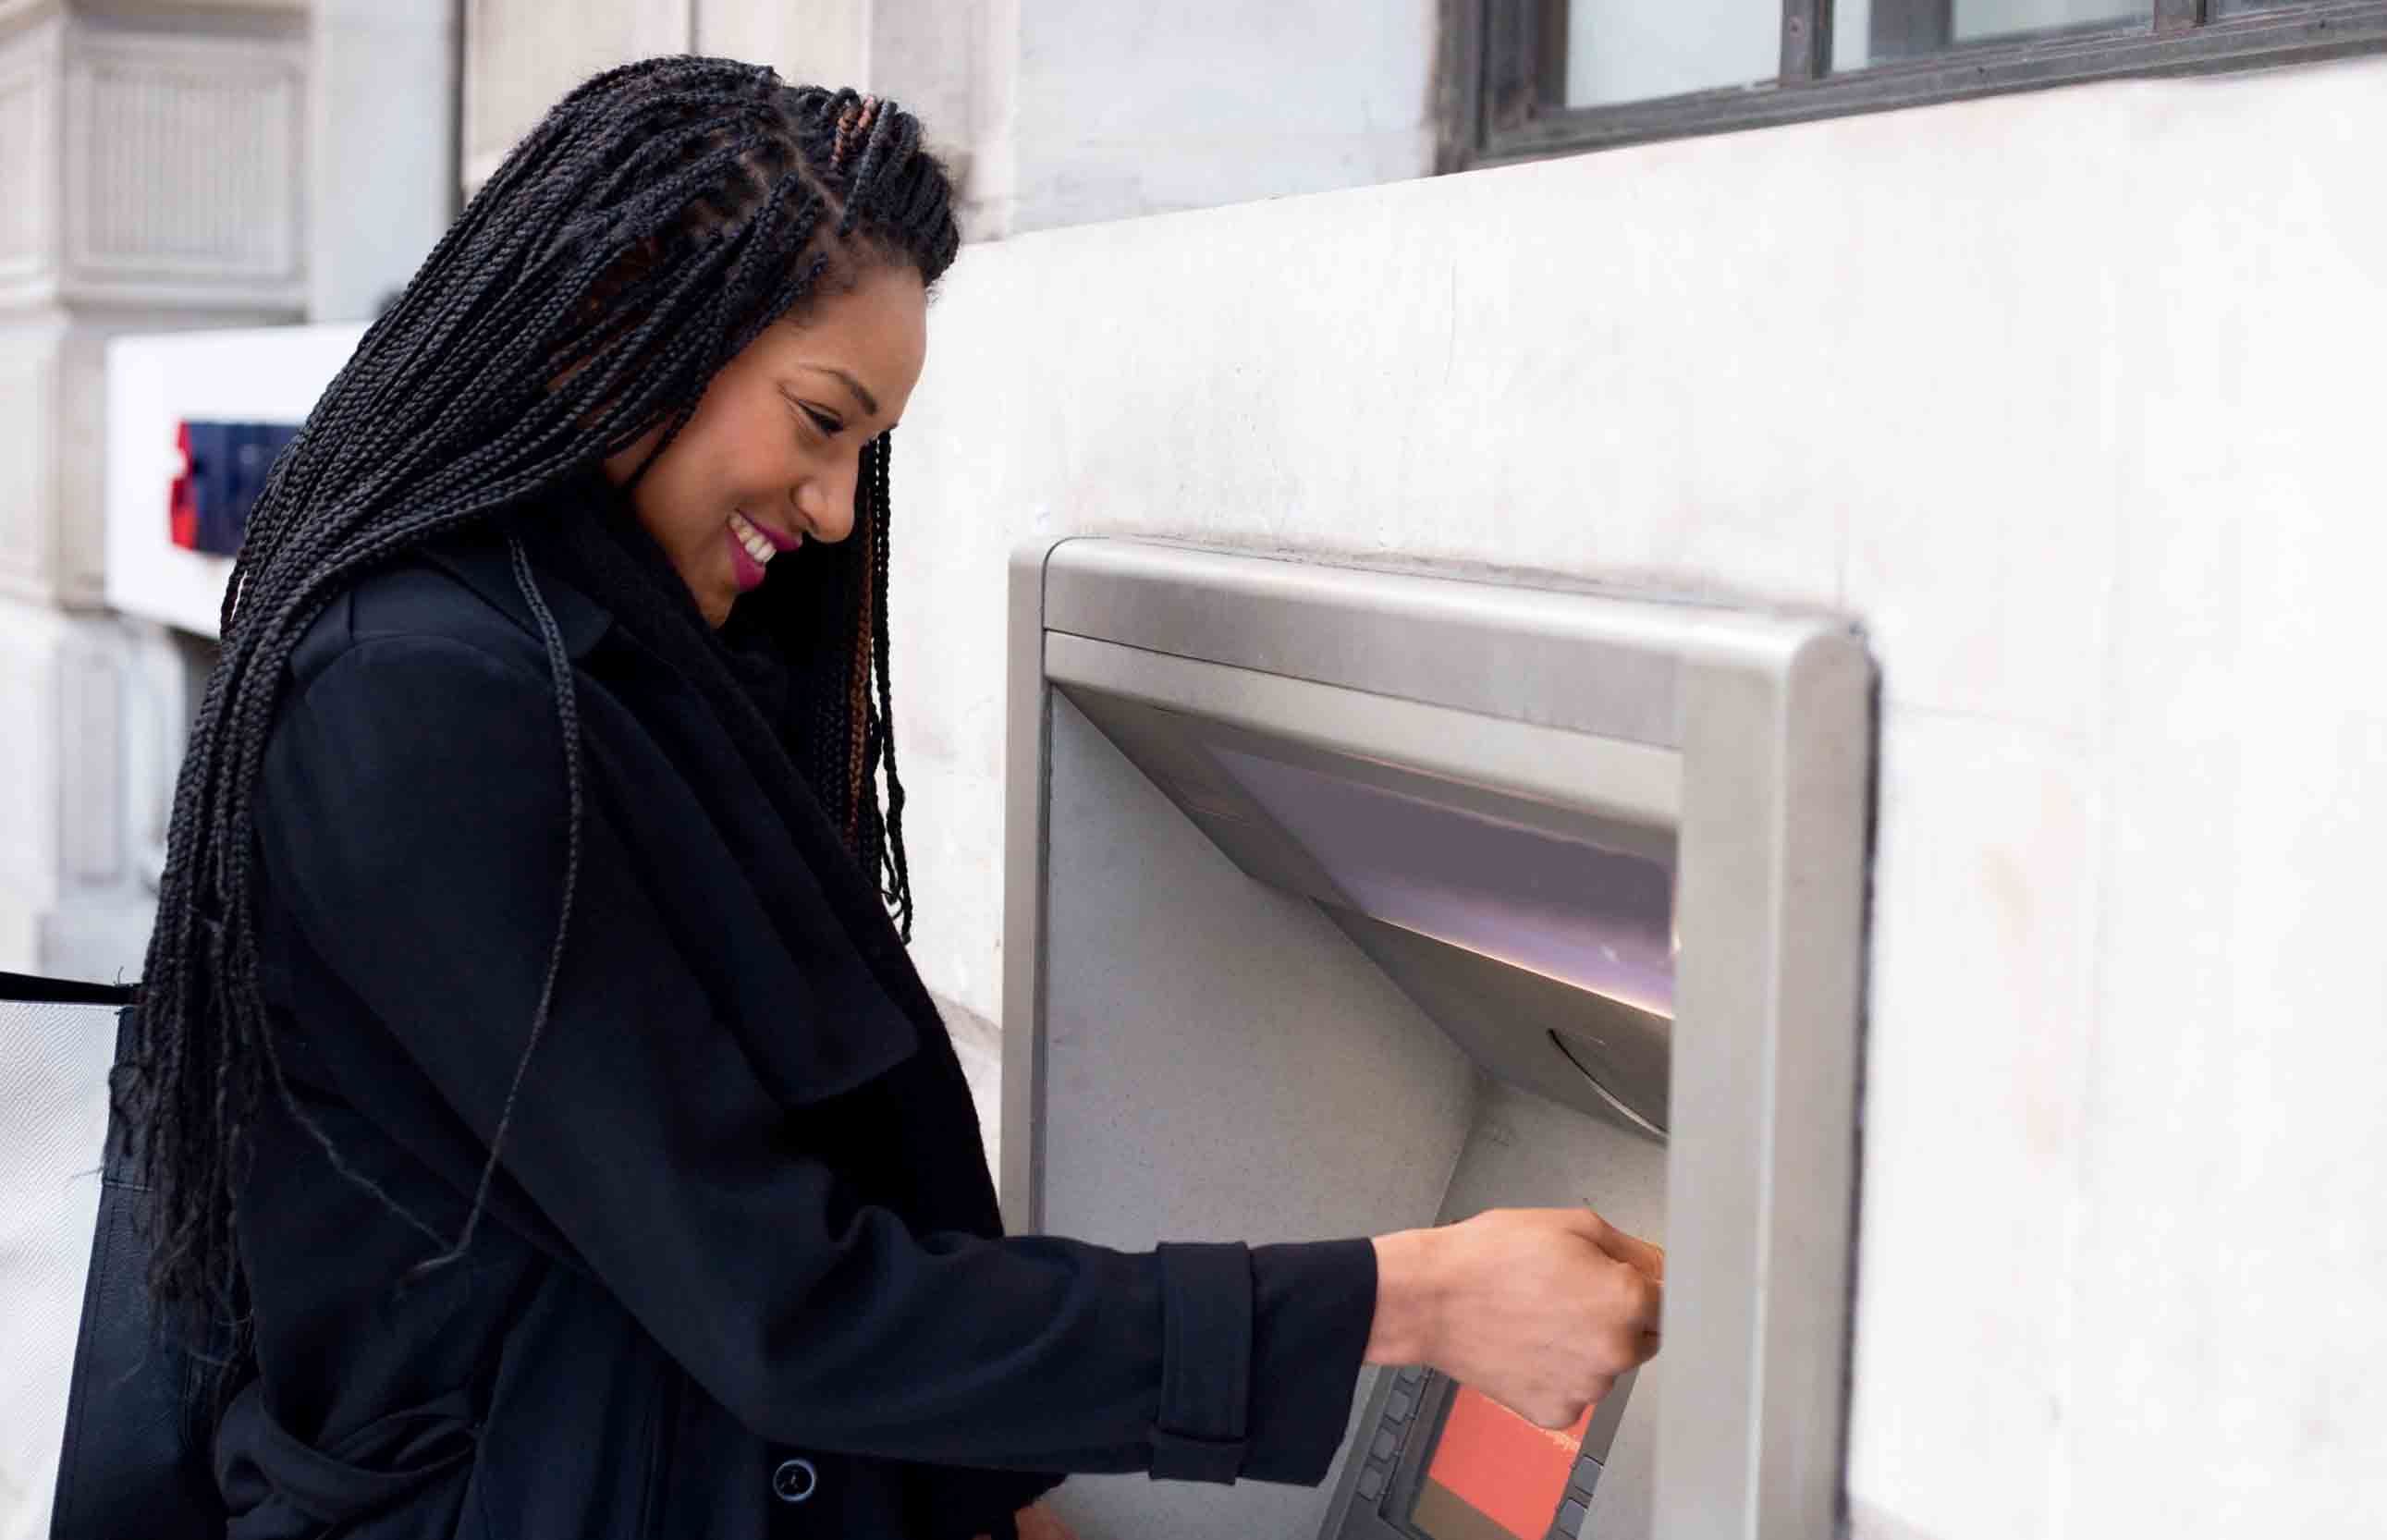 ATM card or debit card